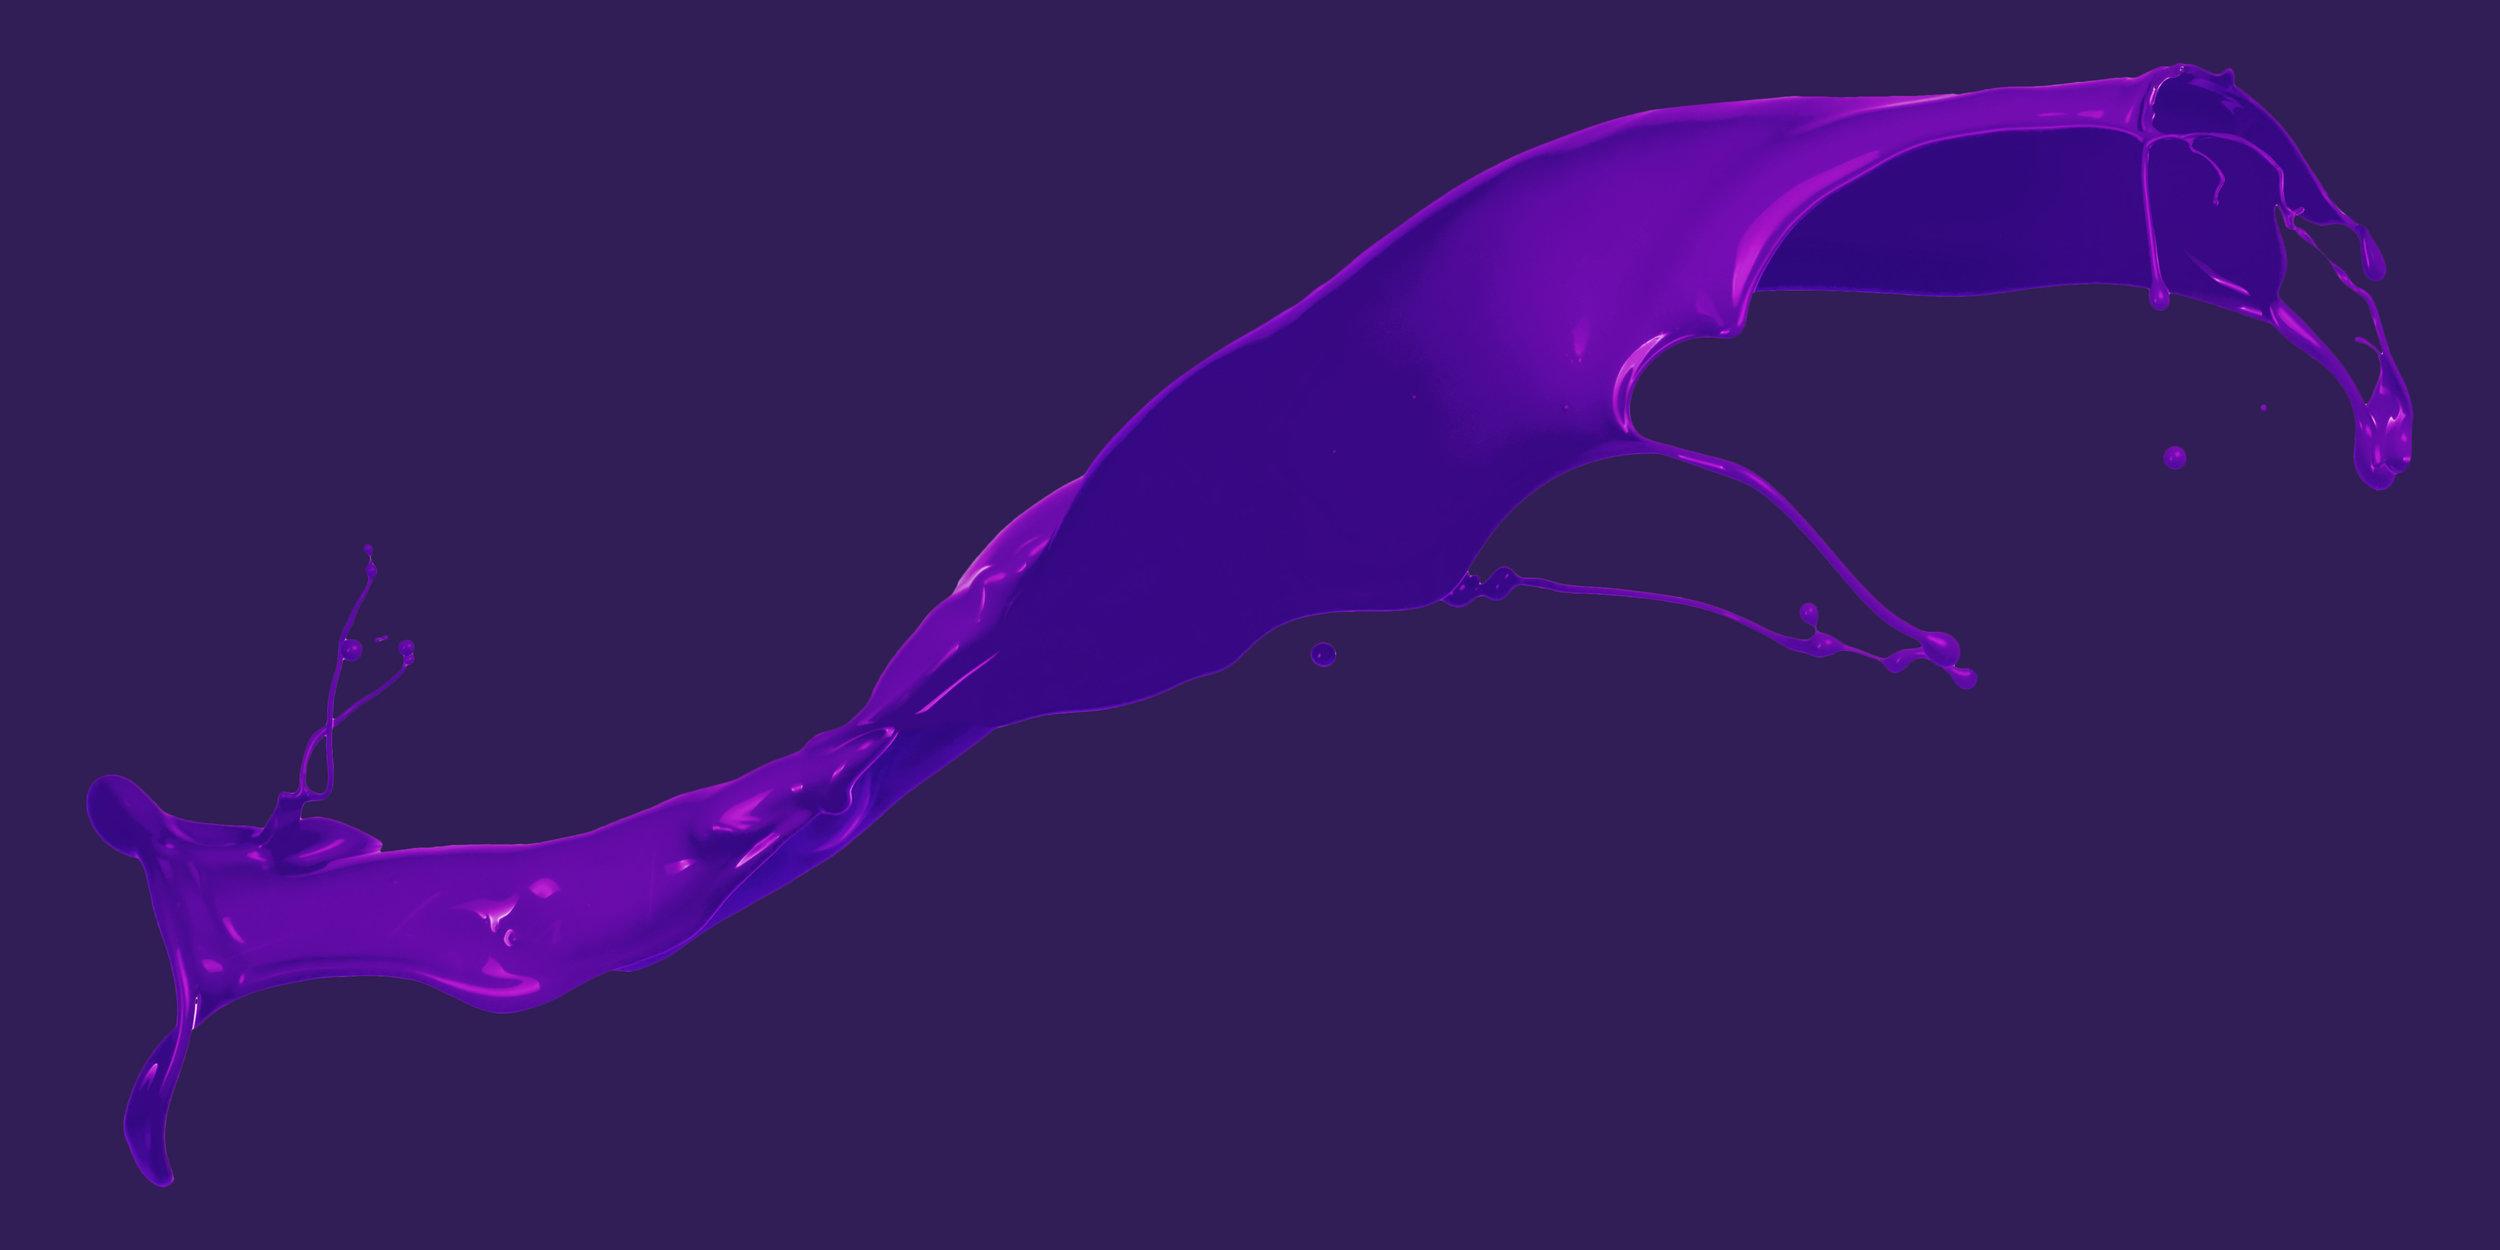 Splash1_DeepPurple.jpg